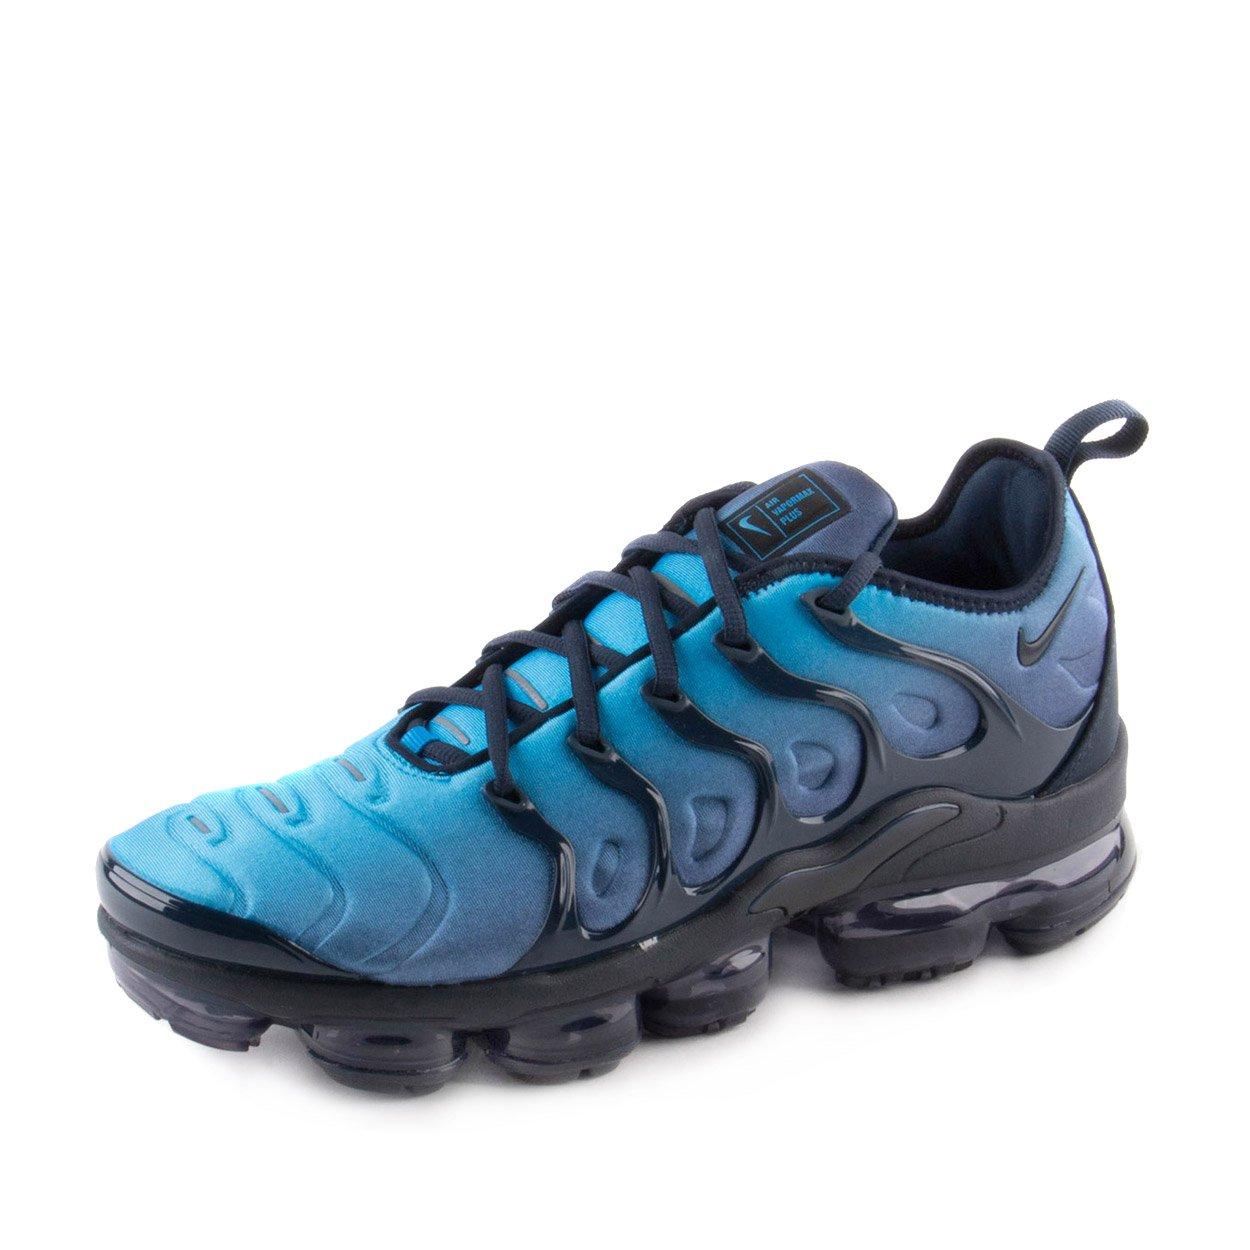 01d4ece84e5 Galleon - Nike Mens Air Vapormax Plus Obsidian Photo Blue Neoprene Size 8